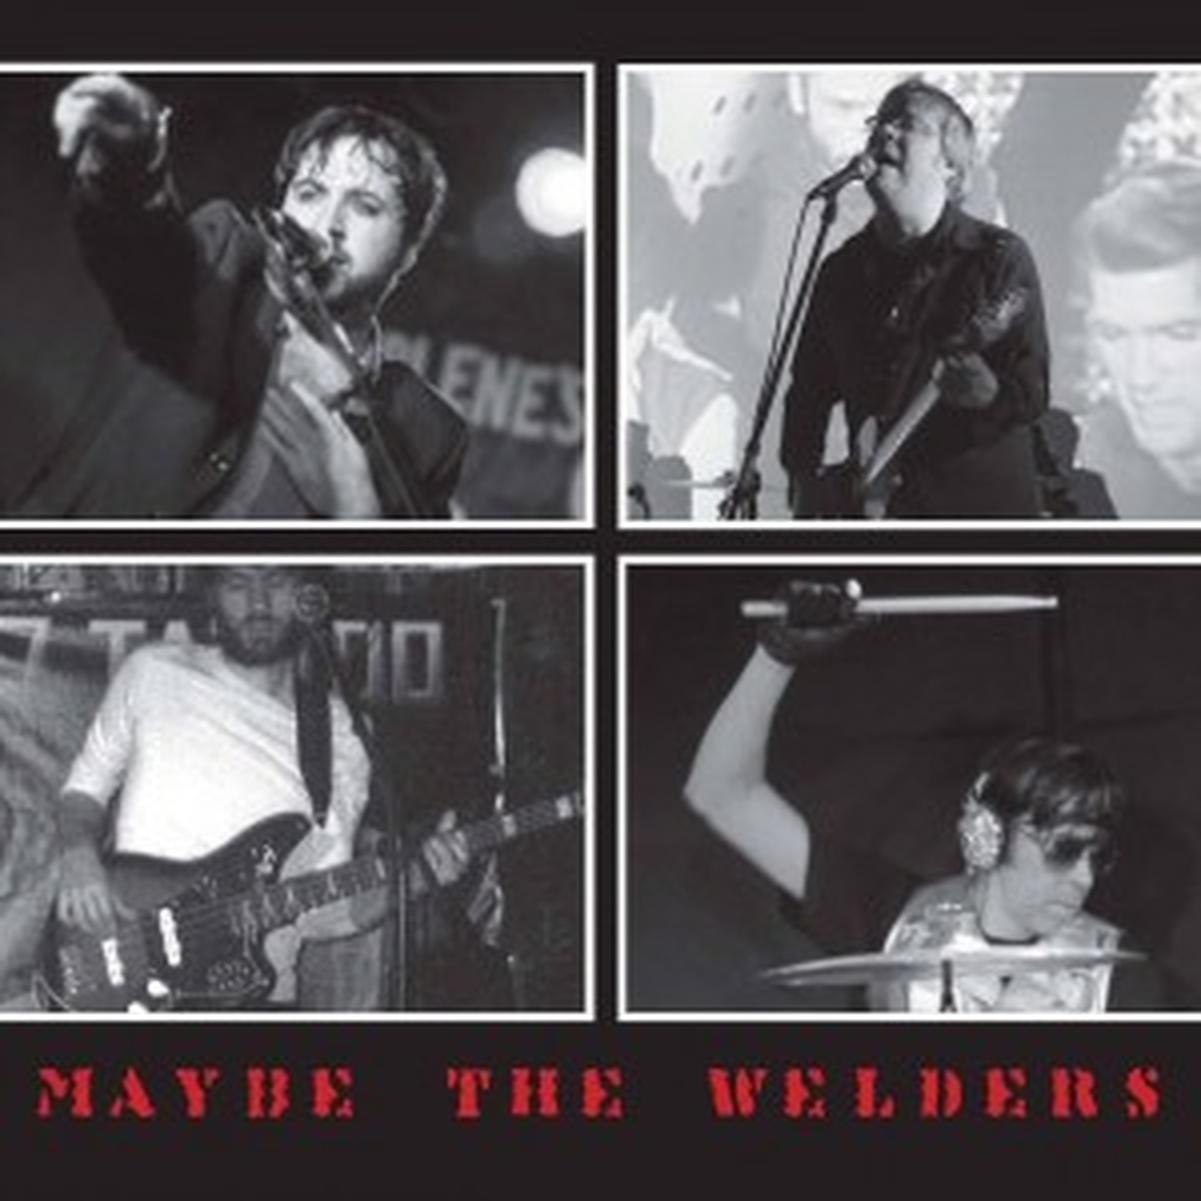 Maybe the Welders